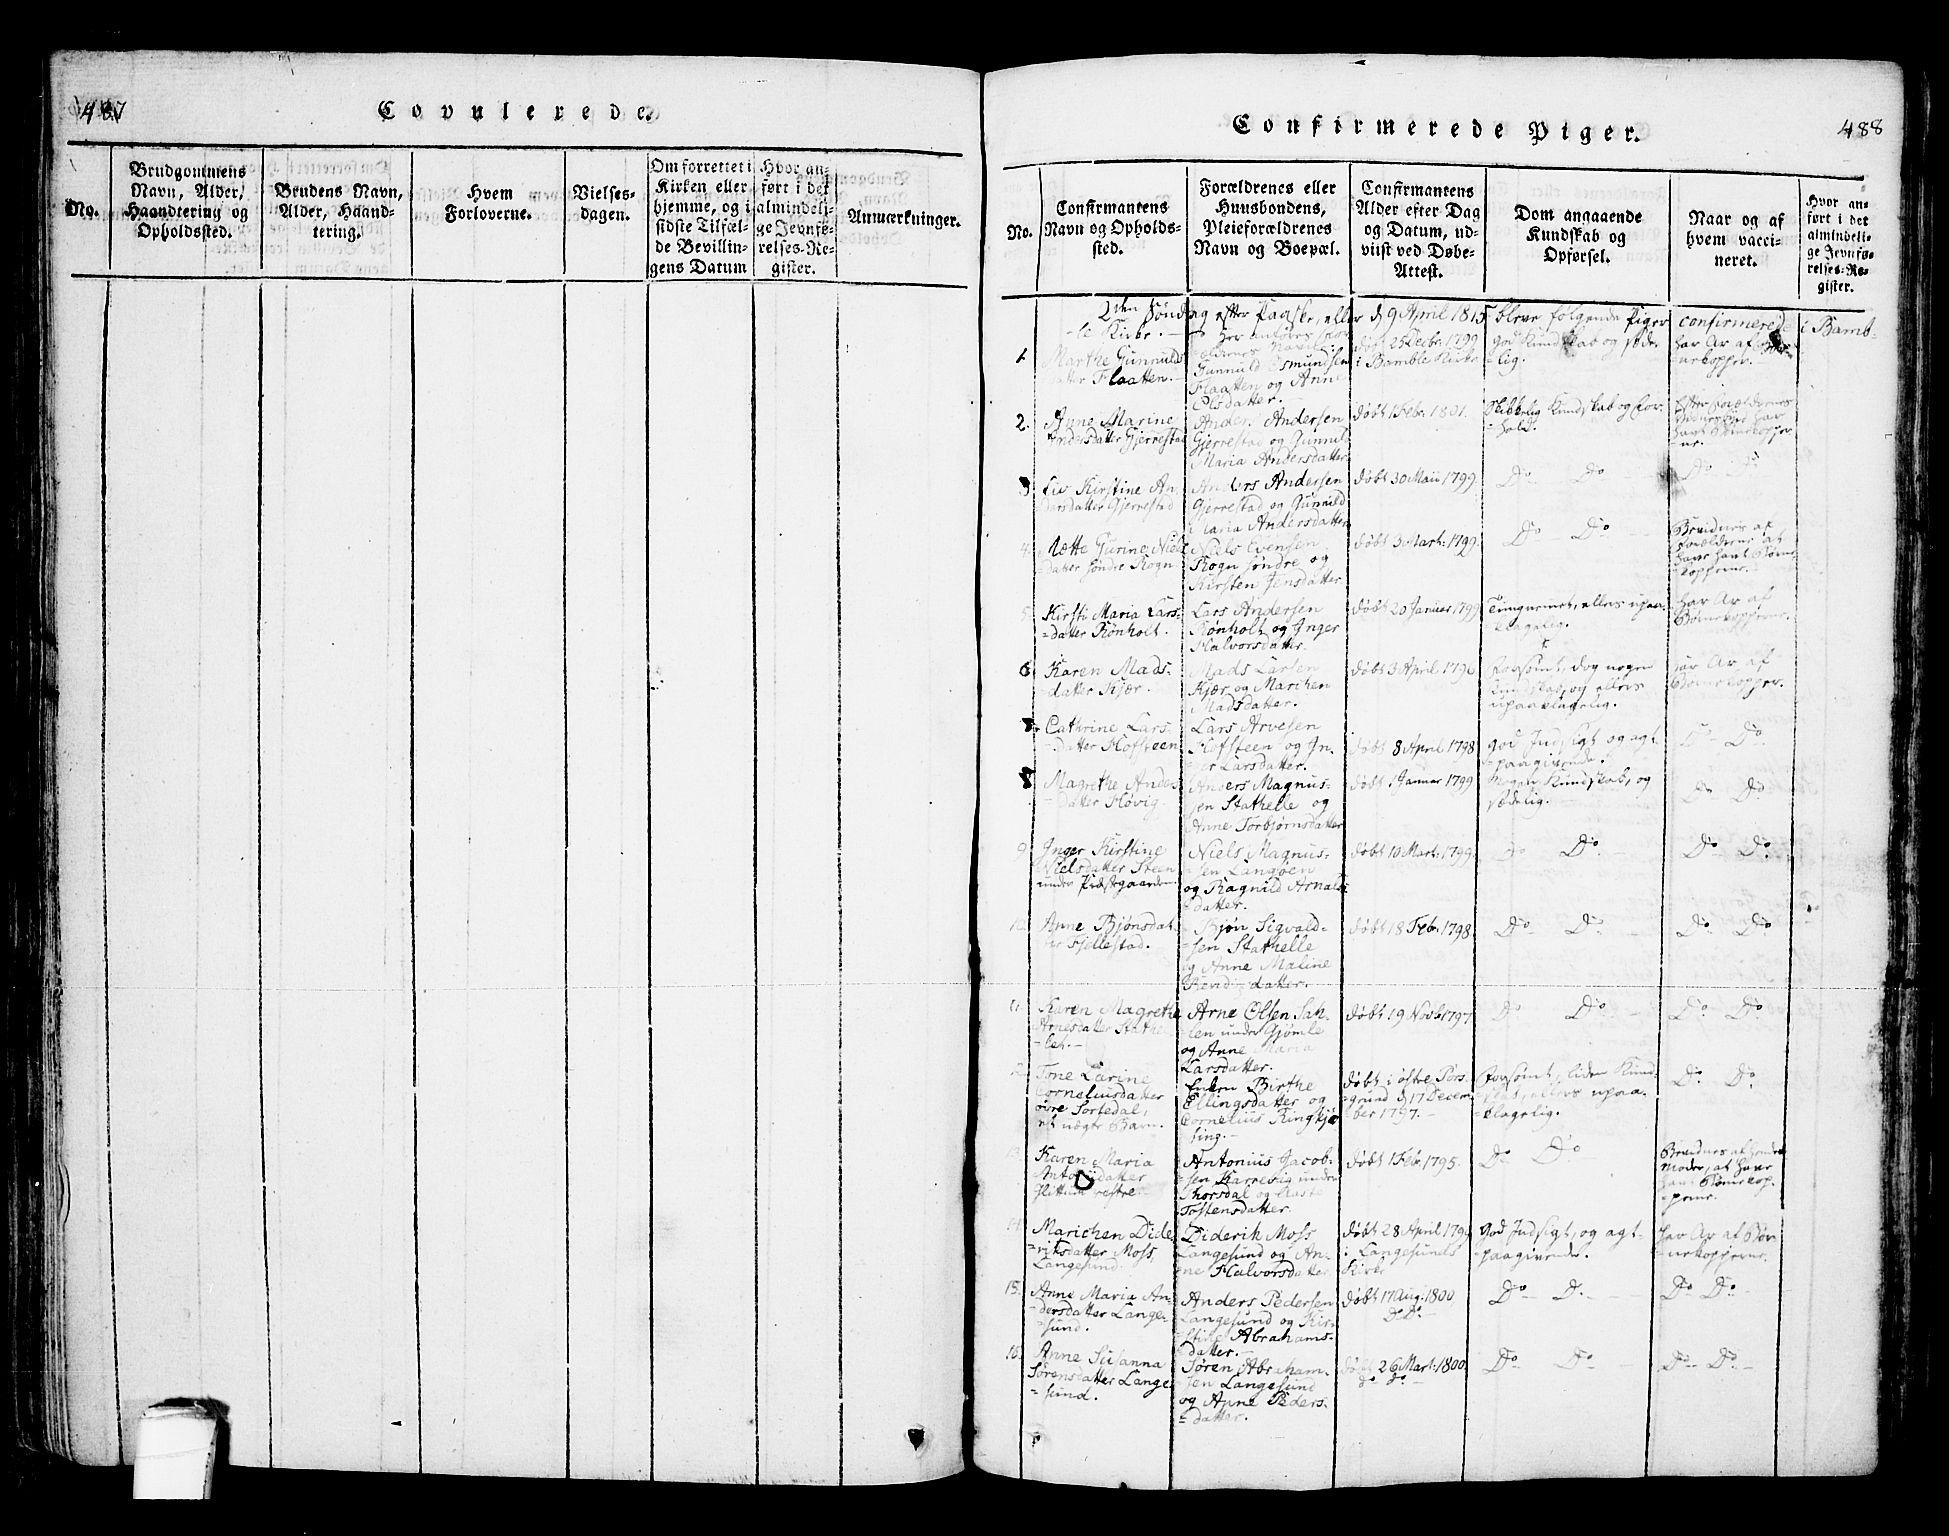 SAKO, Bamble kirkebøker, F/Fa/L0003: Ministerialbok nr. I 3 /1, 1814-1834, s. 487-488